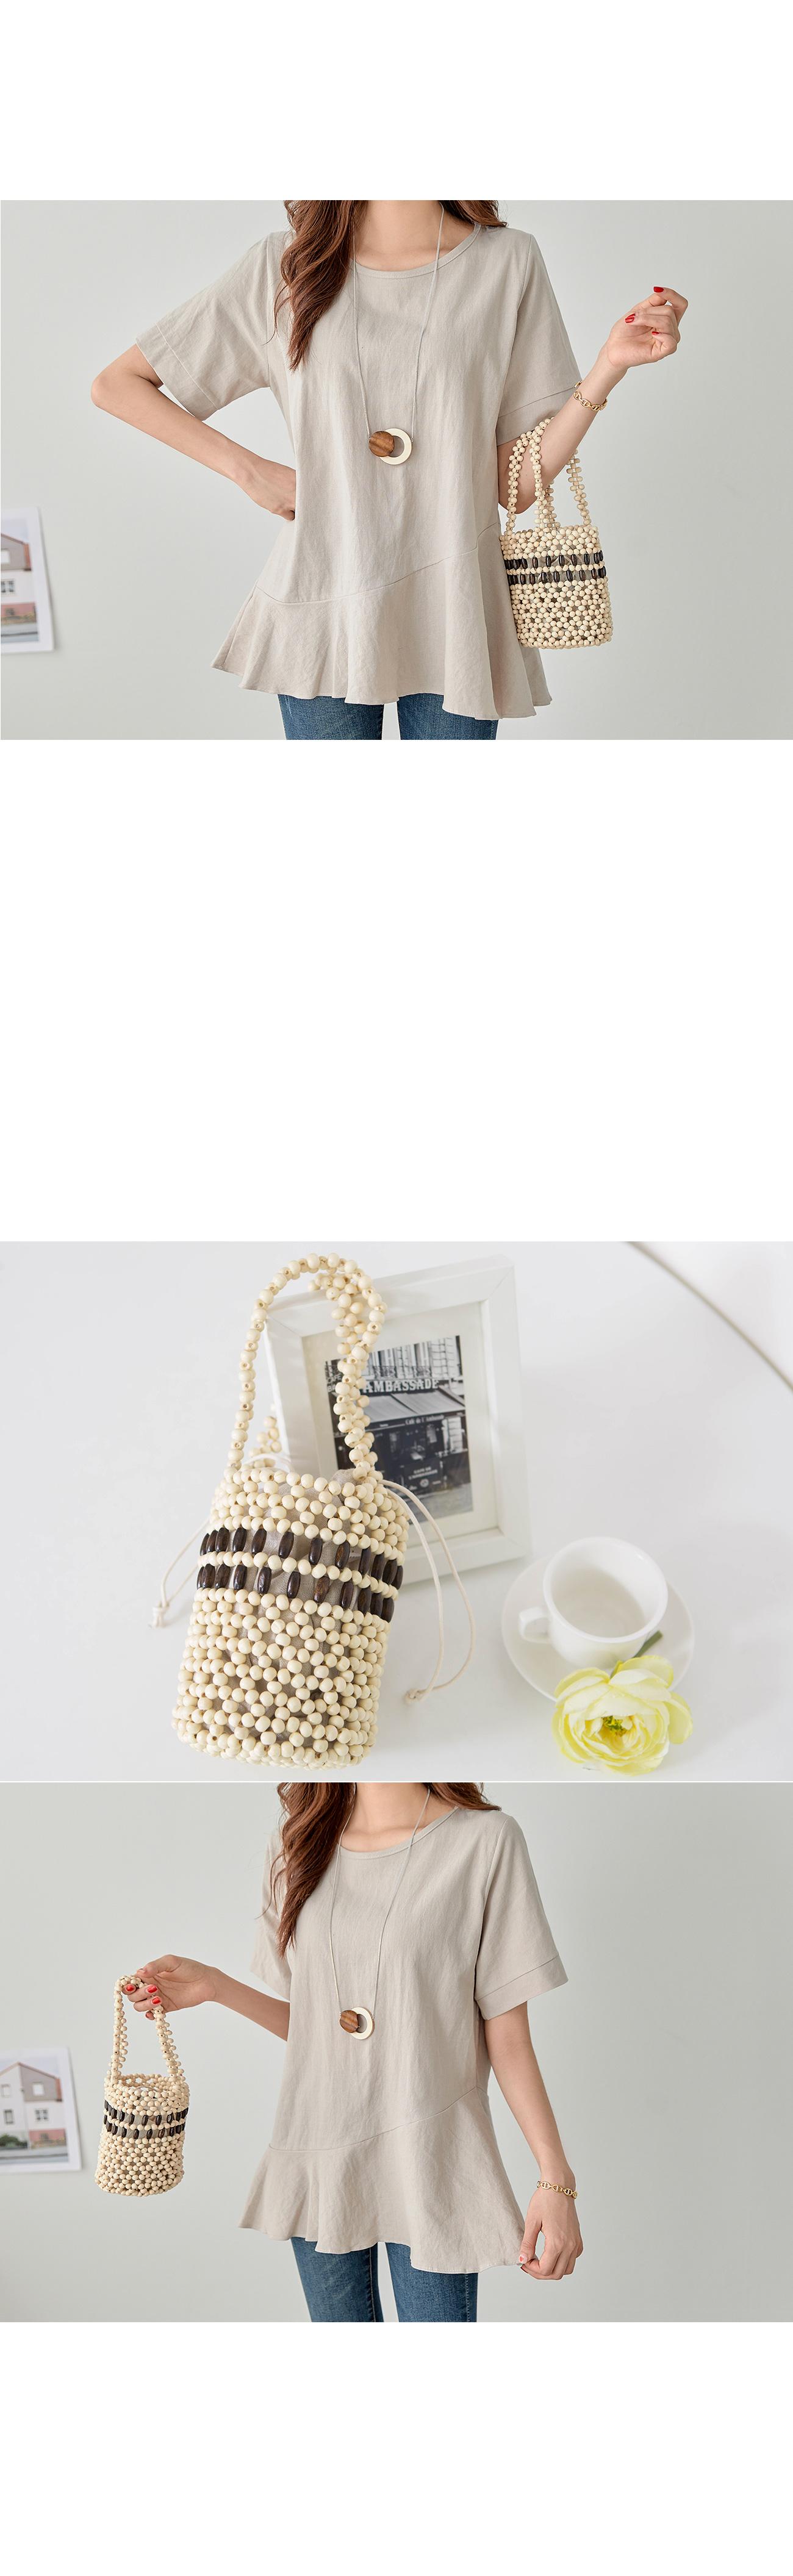 Woodring pouch bucket bag #85380